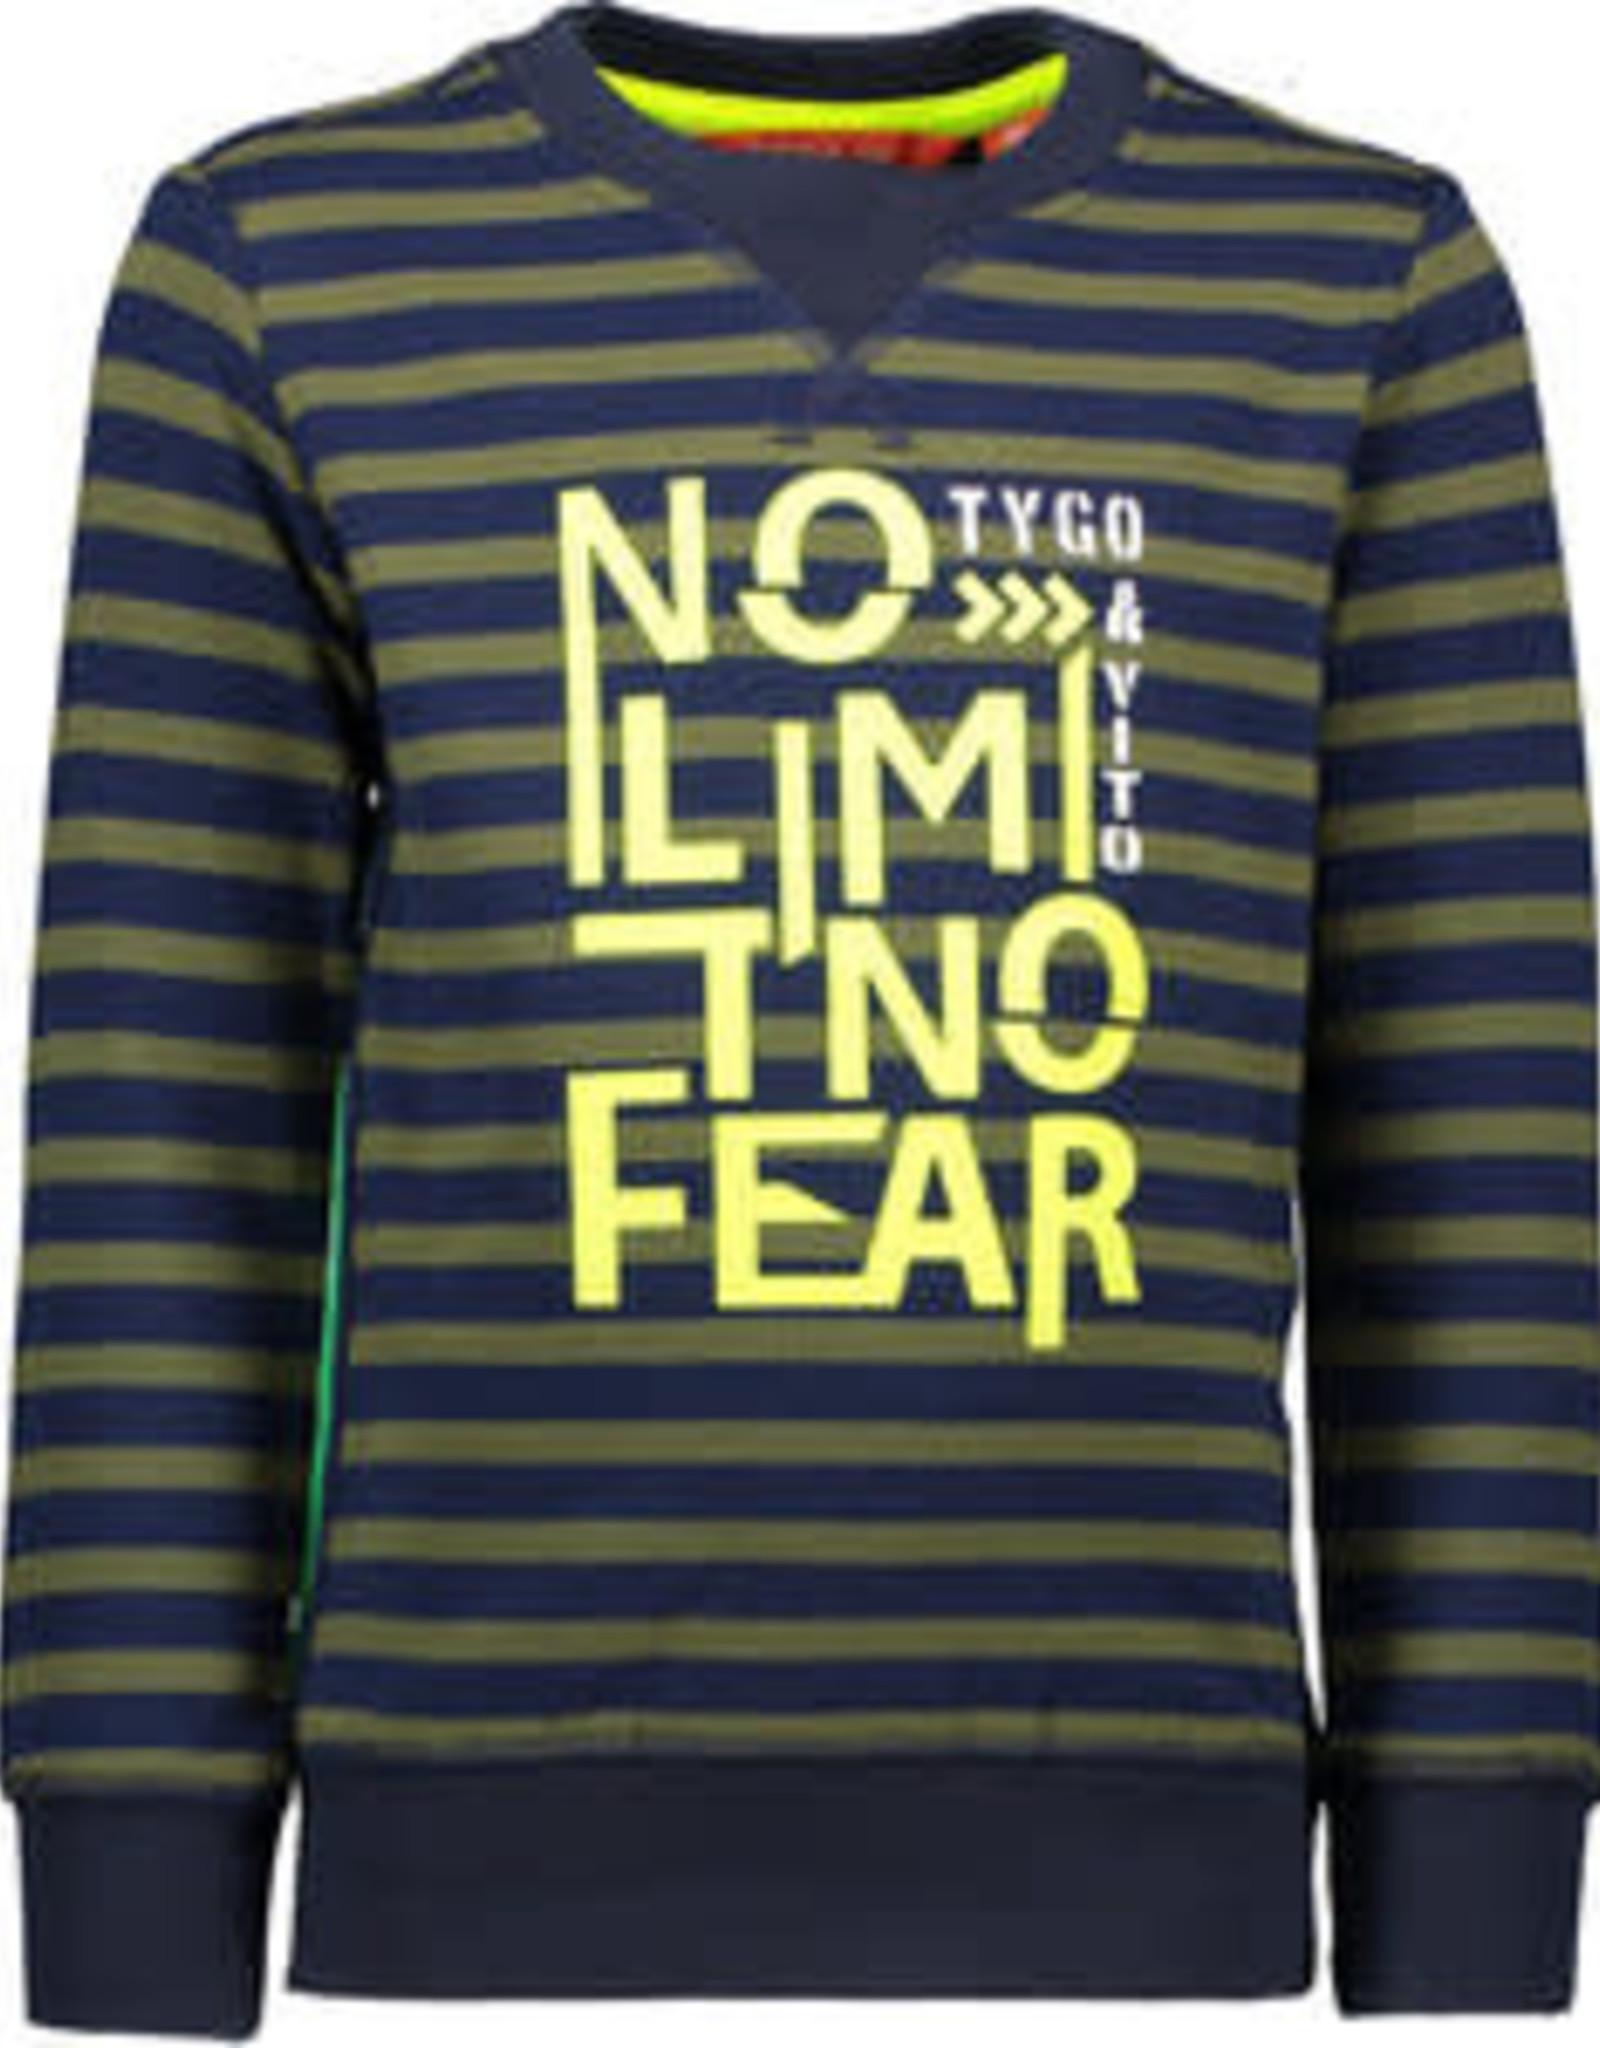 Tygo & Vito T&v  sweater stripe NO LIMIT NO FEAR